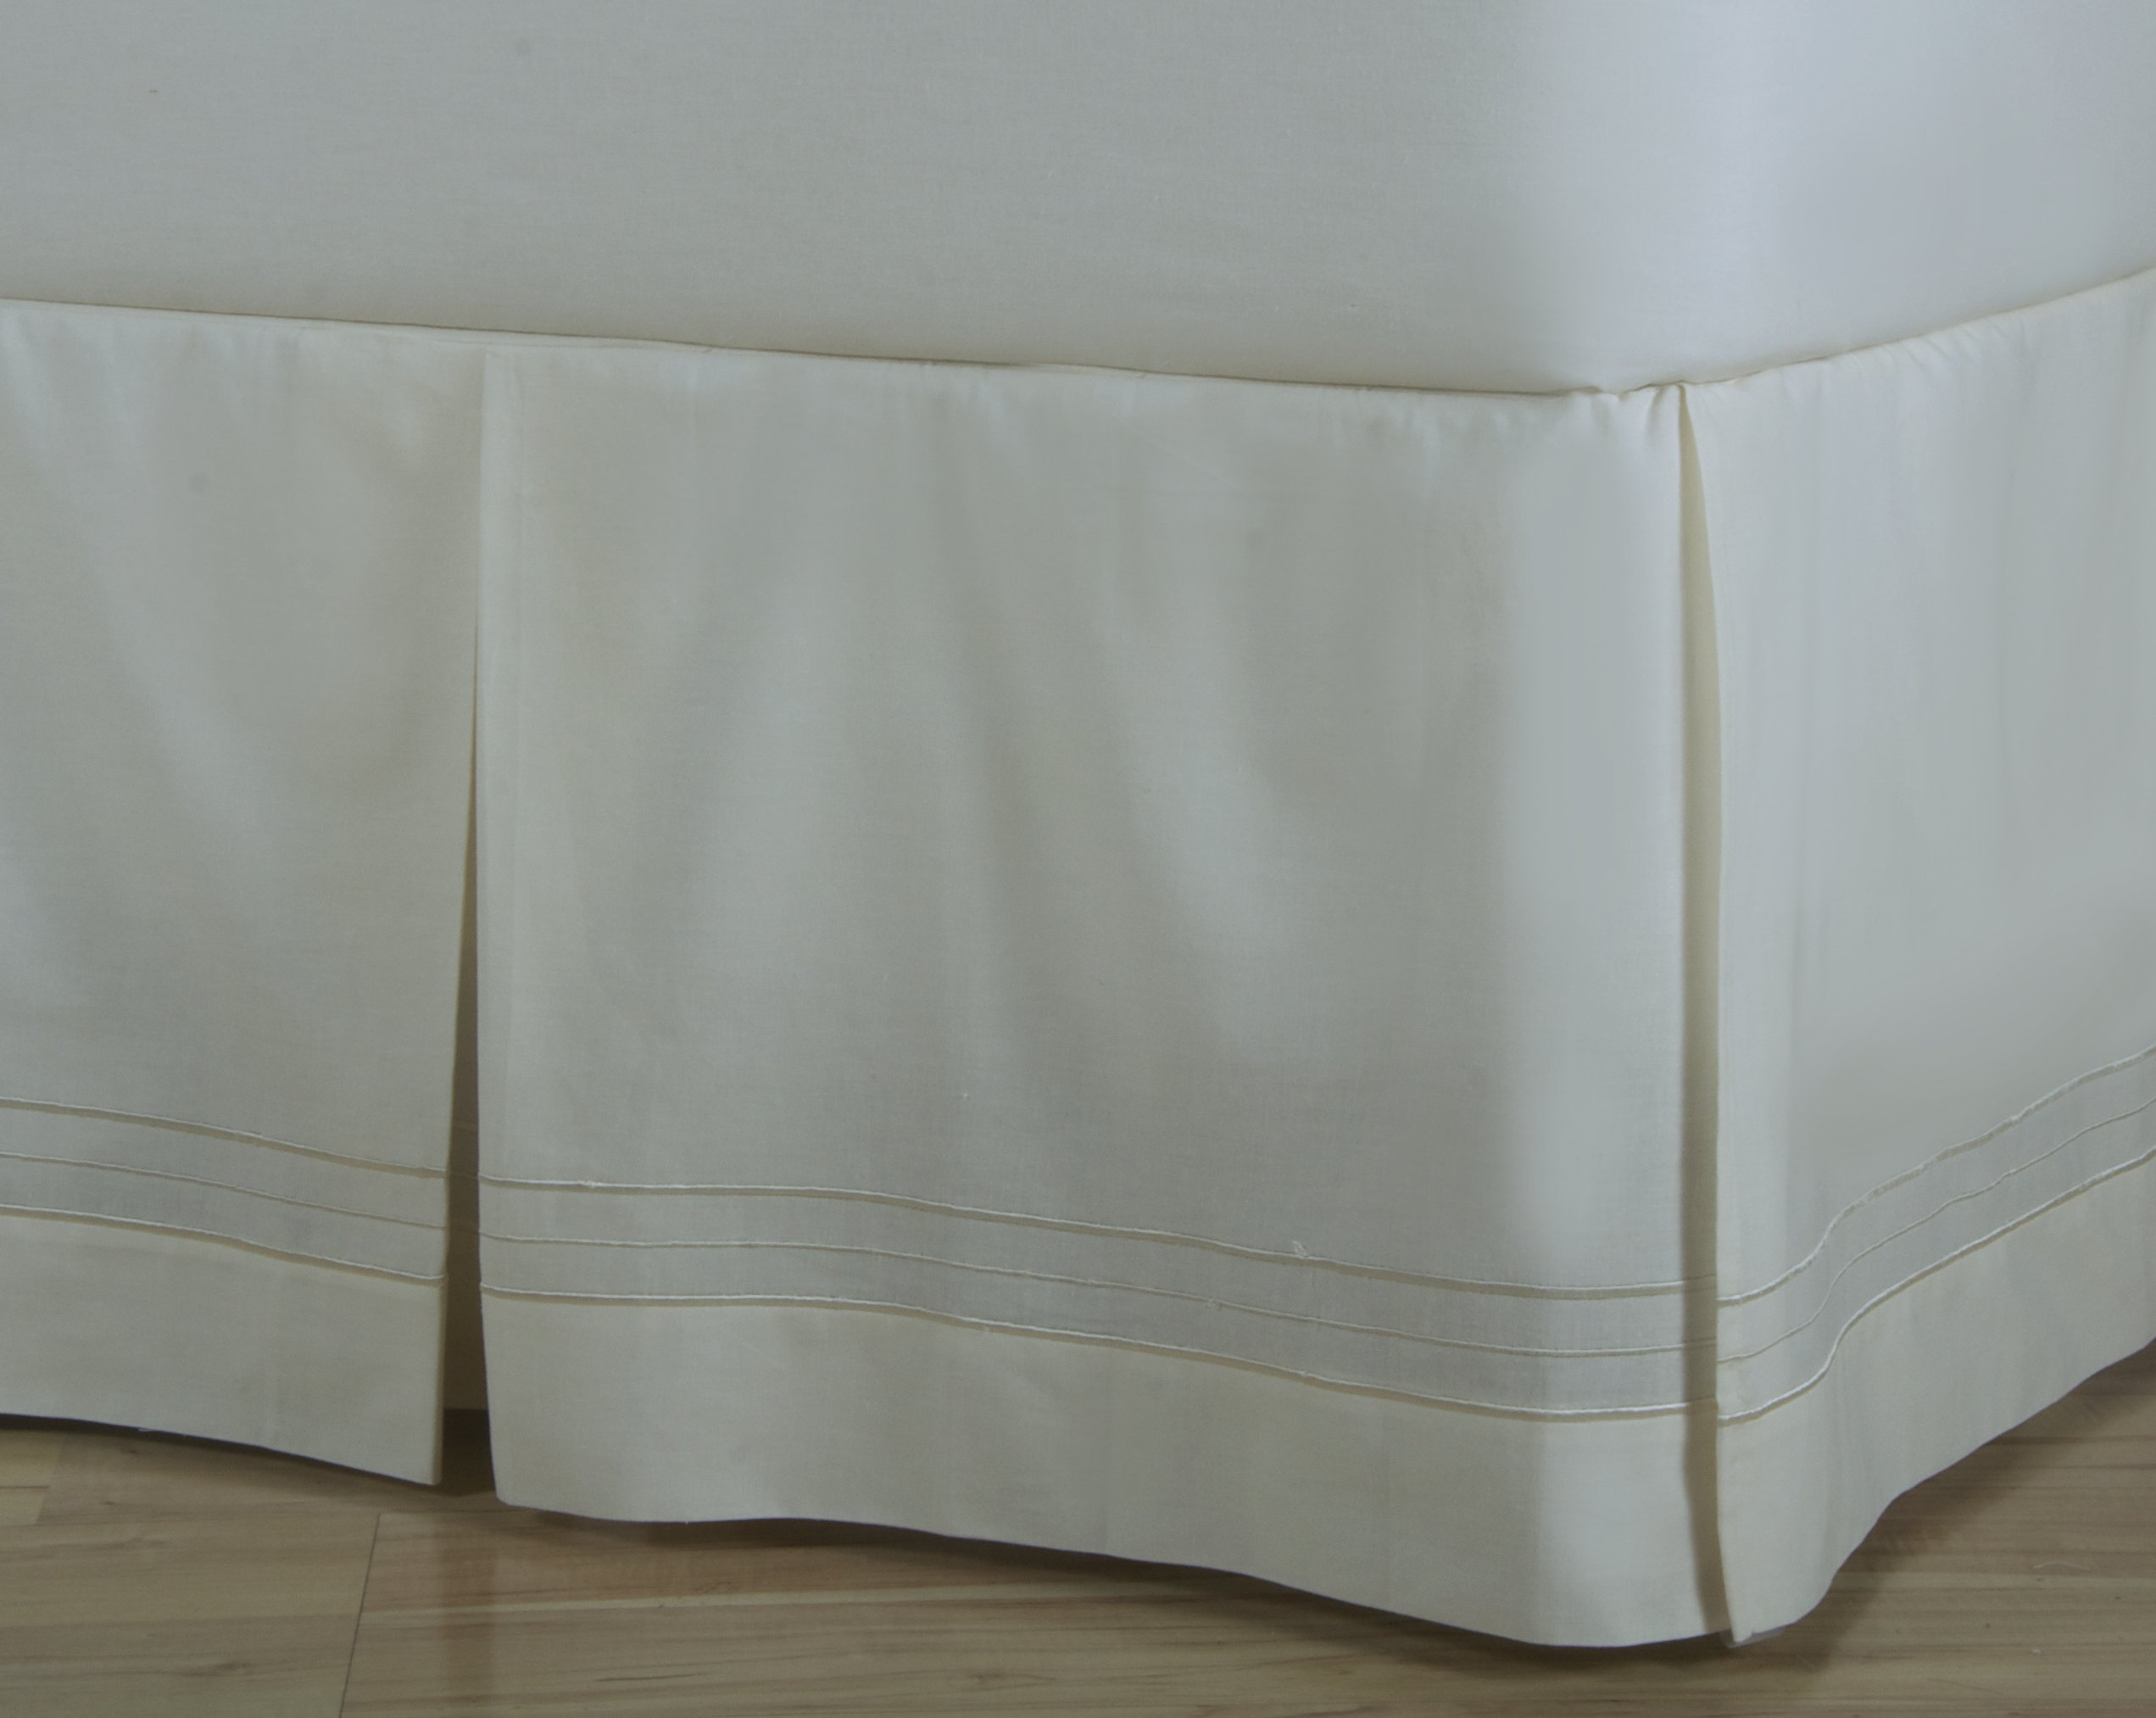 D. Kwitman & Son Hotel Stripe Box Pleat 18'' Drop Bed Skirt, Twin, Natural